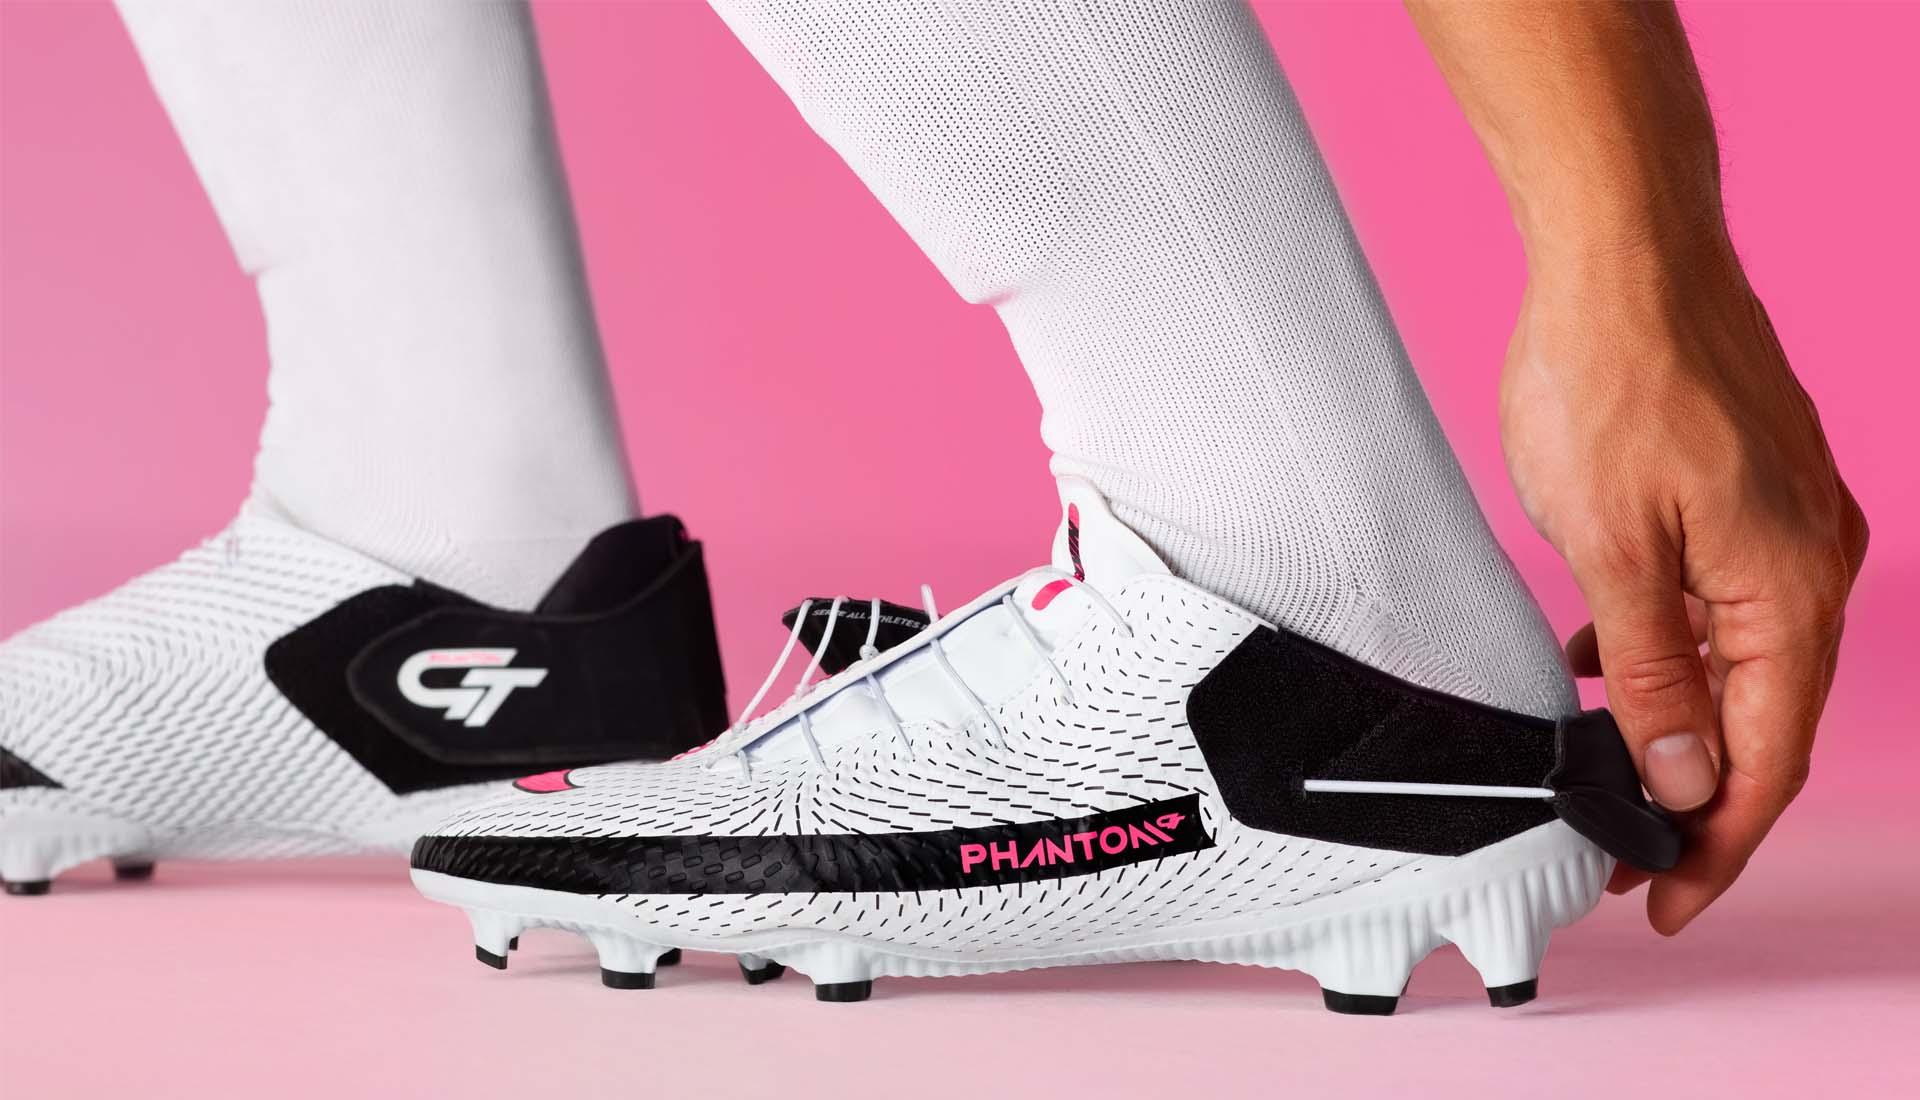 Giày đá bóng Nike Phantom GT Academy FlyEase